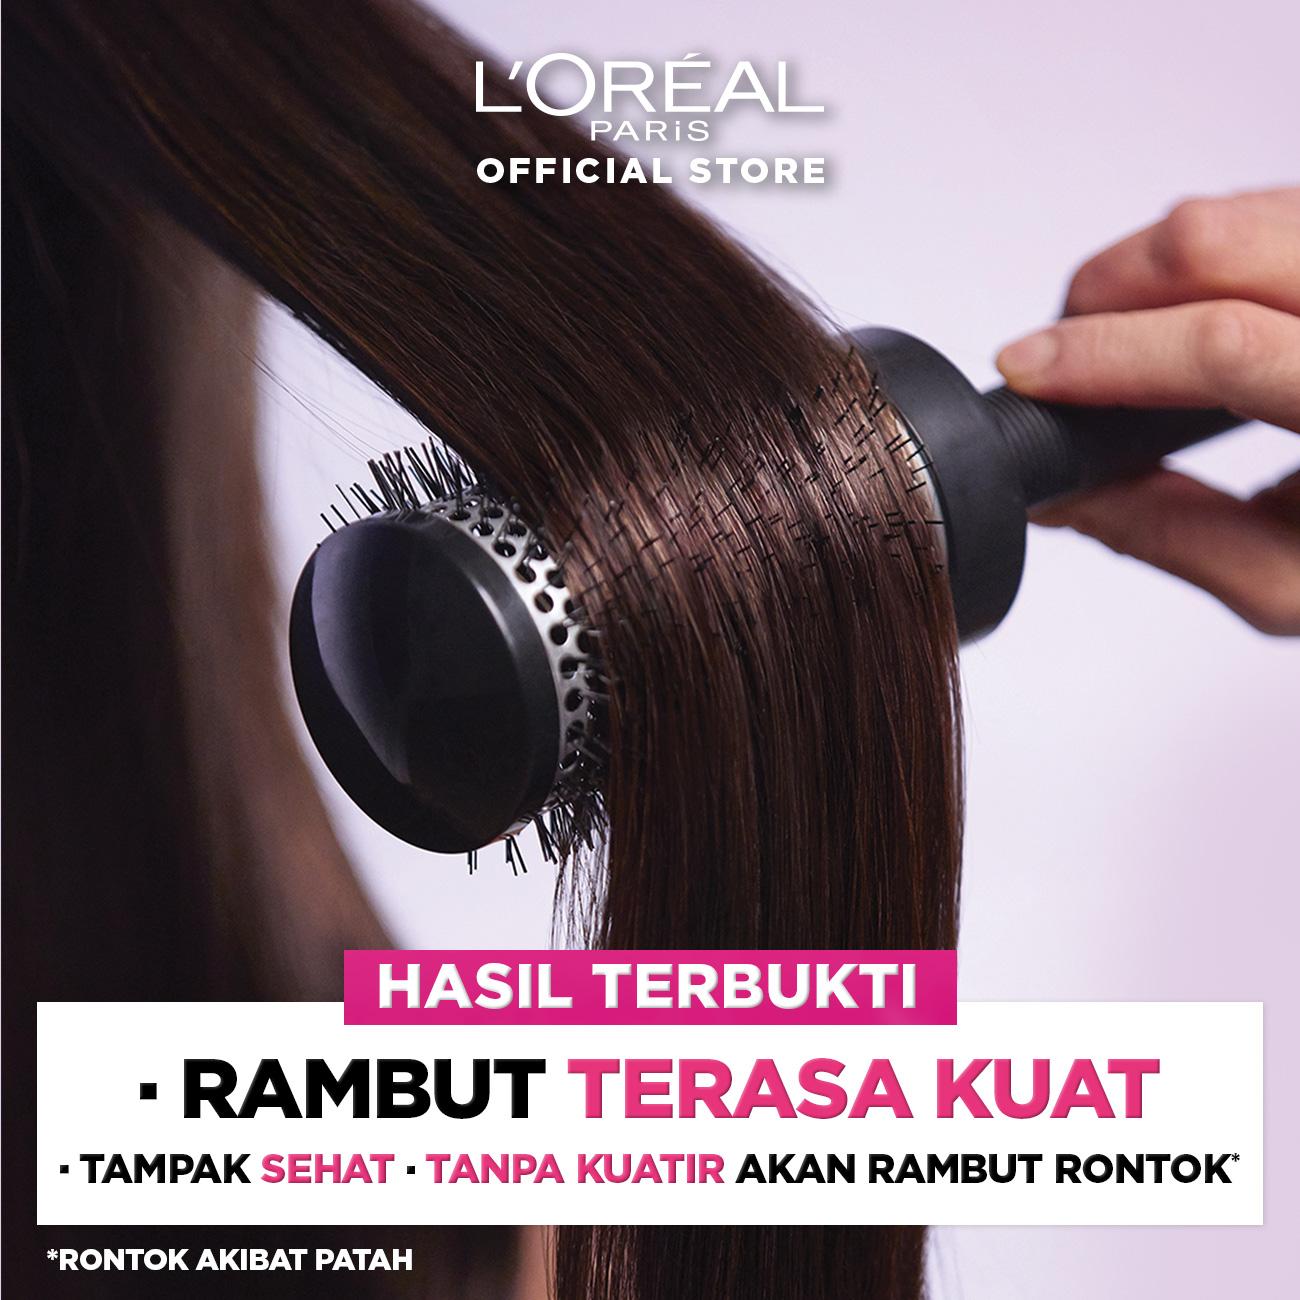 L'Oreal Paris Fall Resist 3x Shampoo Hair Care - 280ml (Perawatan Untuk Rambut Mudah Rontok)-5